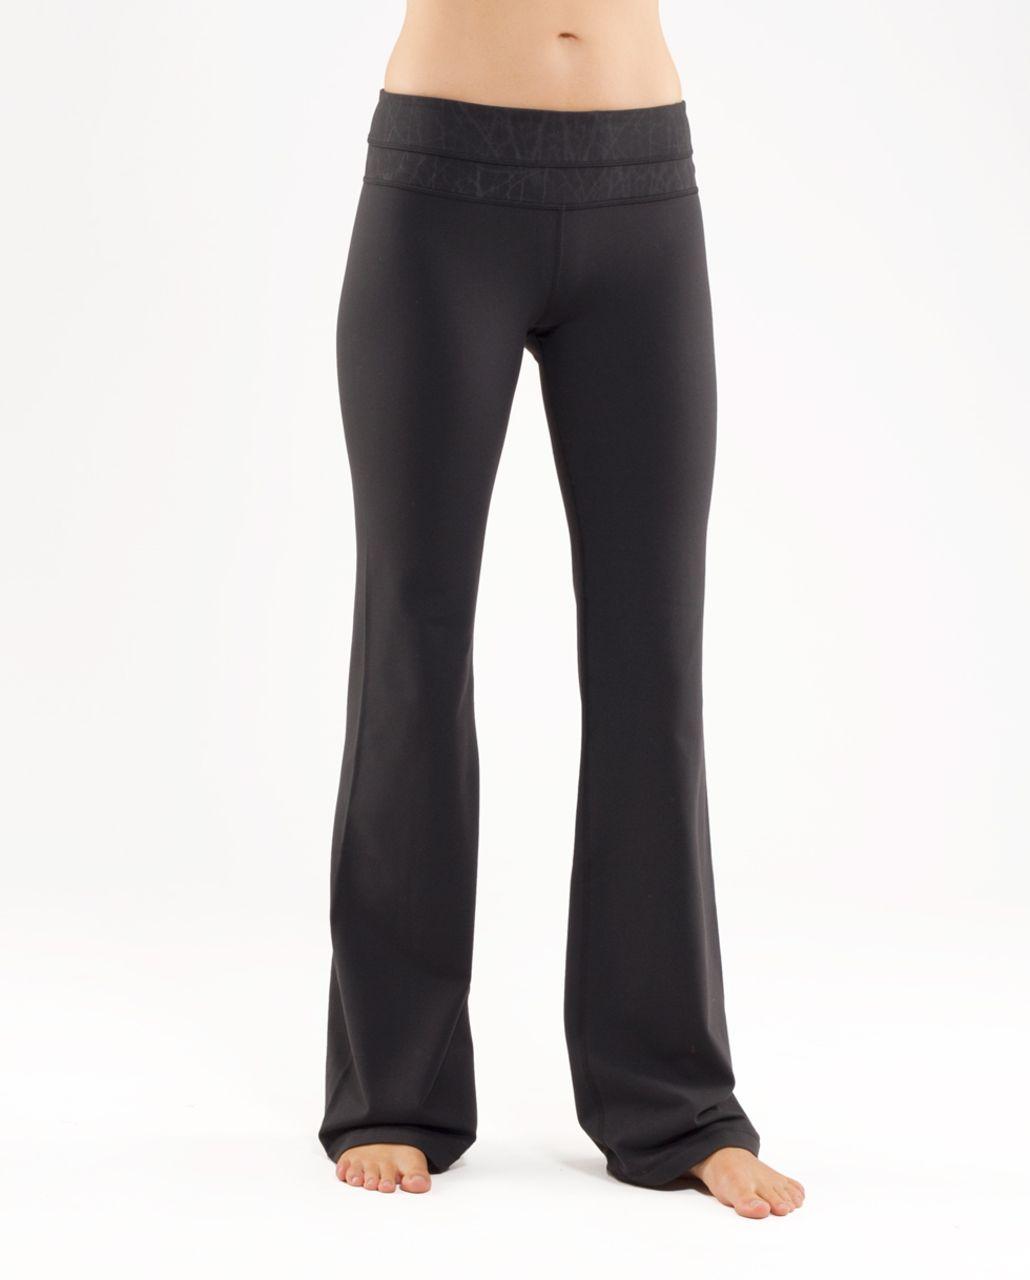 Lululemon Groove Pant (Regular) - Black /  Black Nesting Black Bird Print